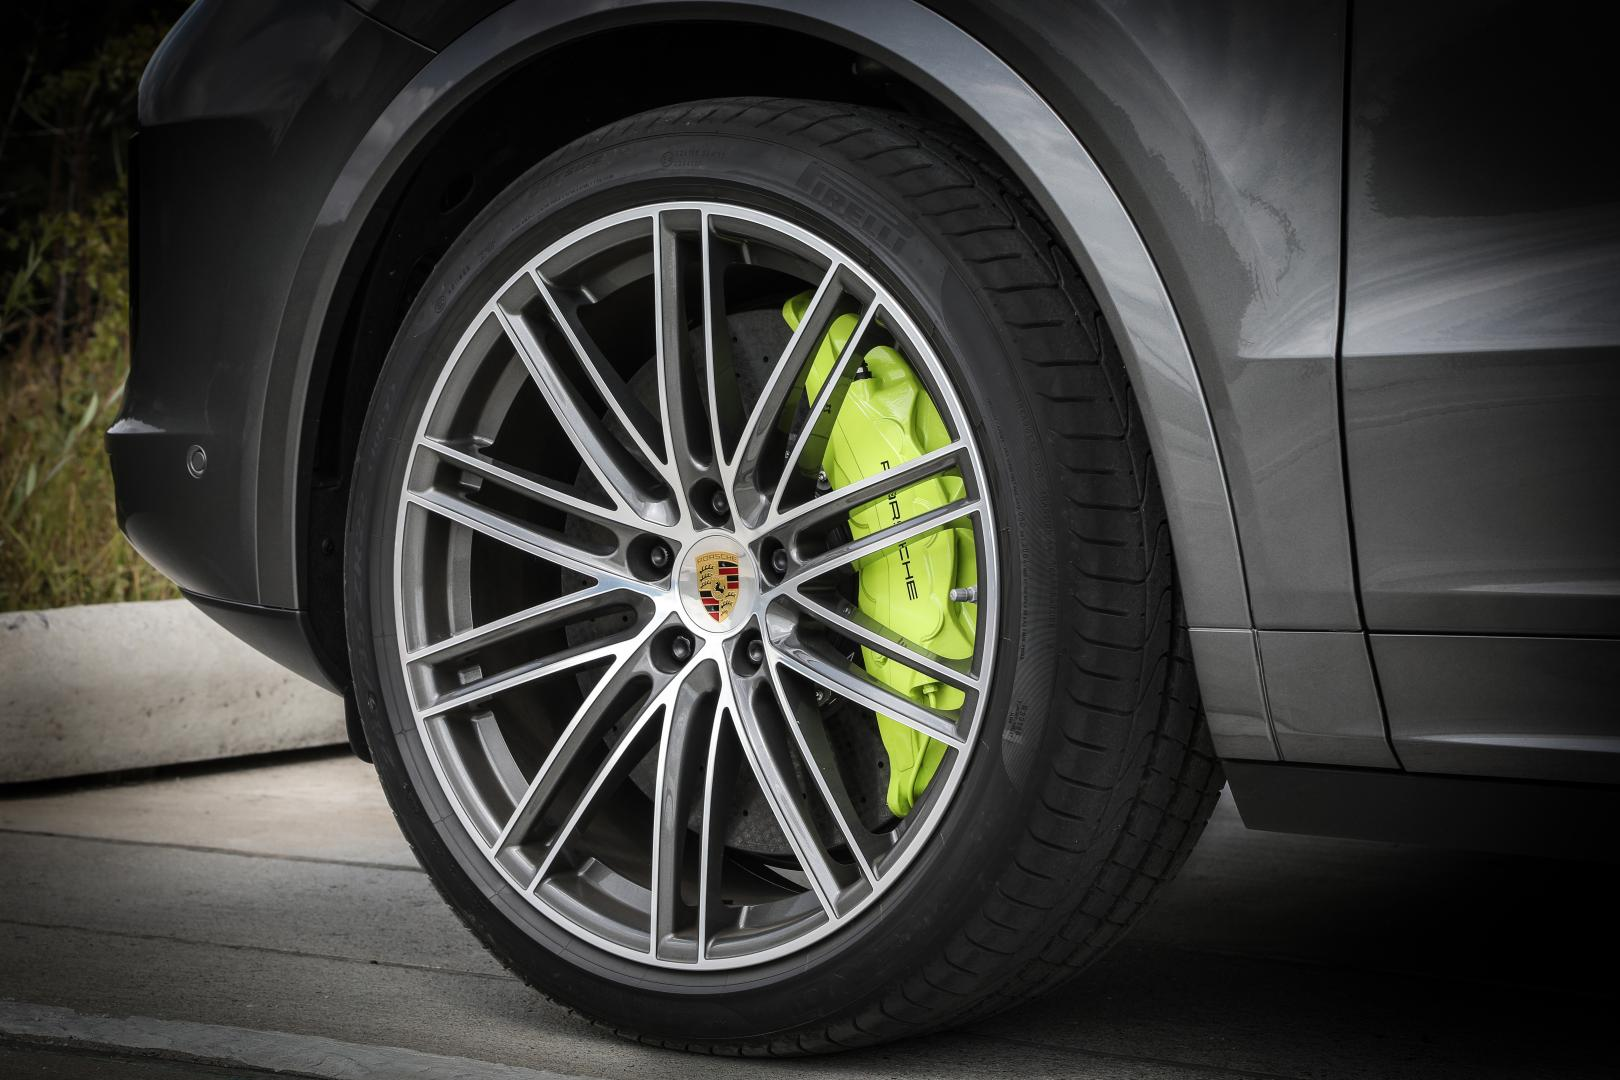 Porsche Cayenne TurPorsche Cayenne Turbo S Coupe Hybridbo S Coupe Hybrid